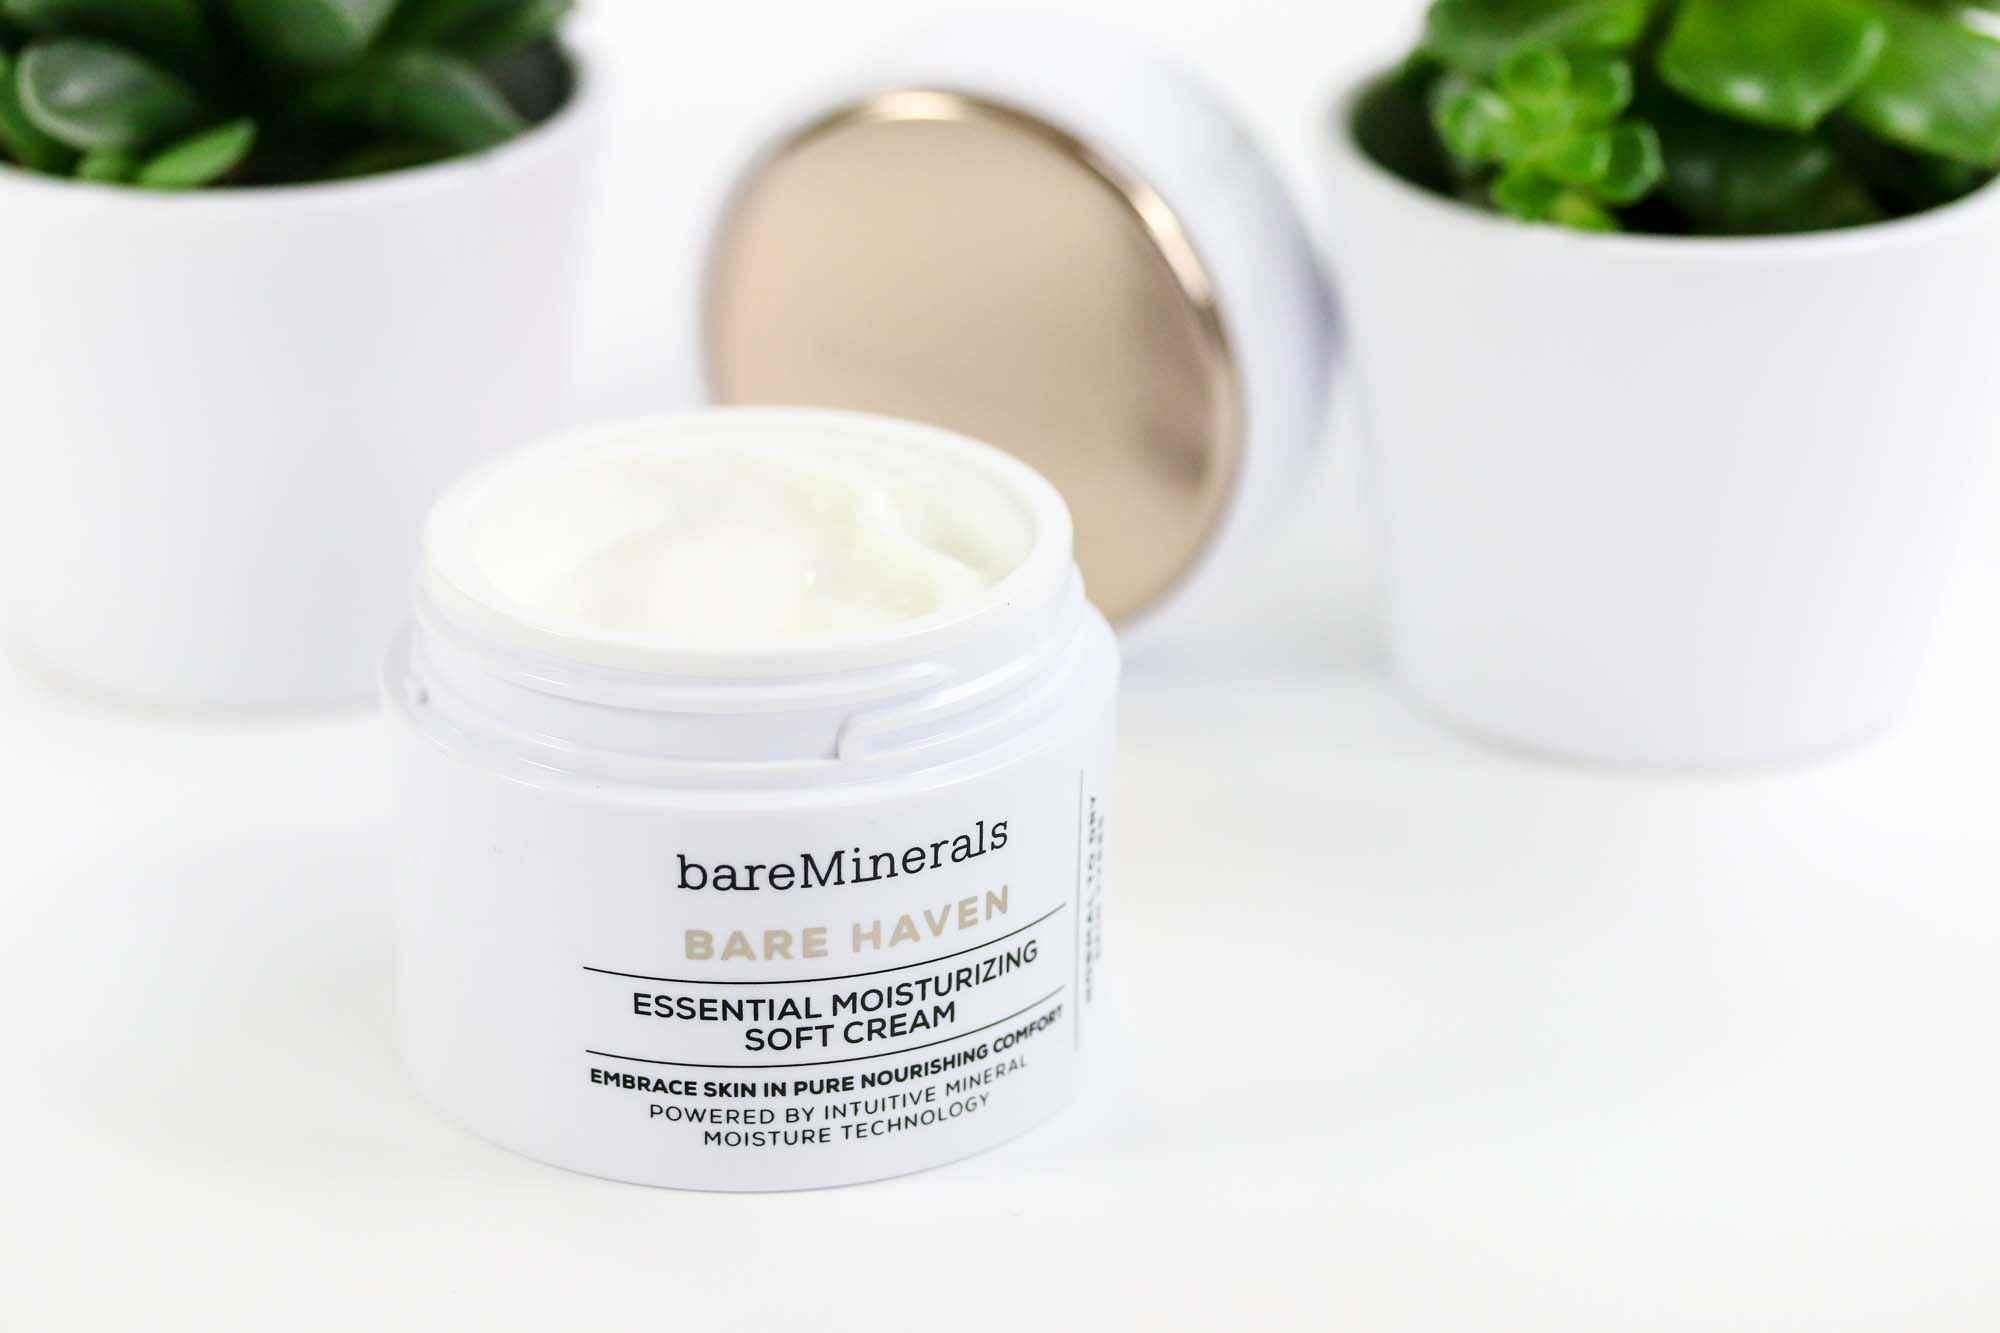 bareMinerals Hautpflege-25